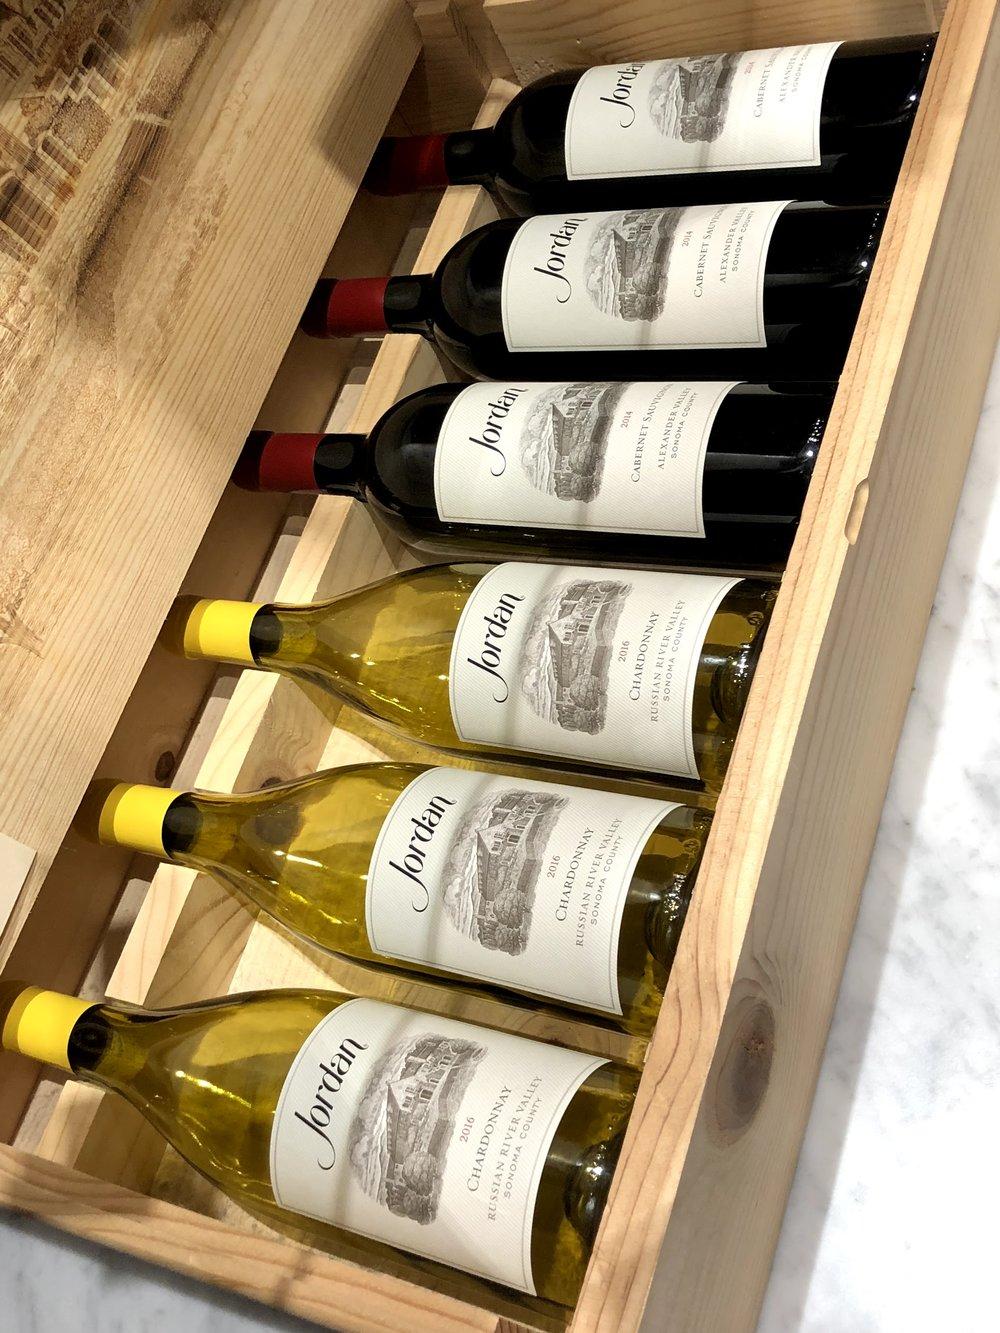 Jordan Chardonnay and Cabernet